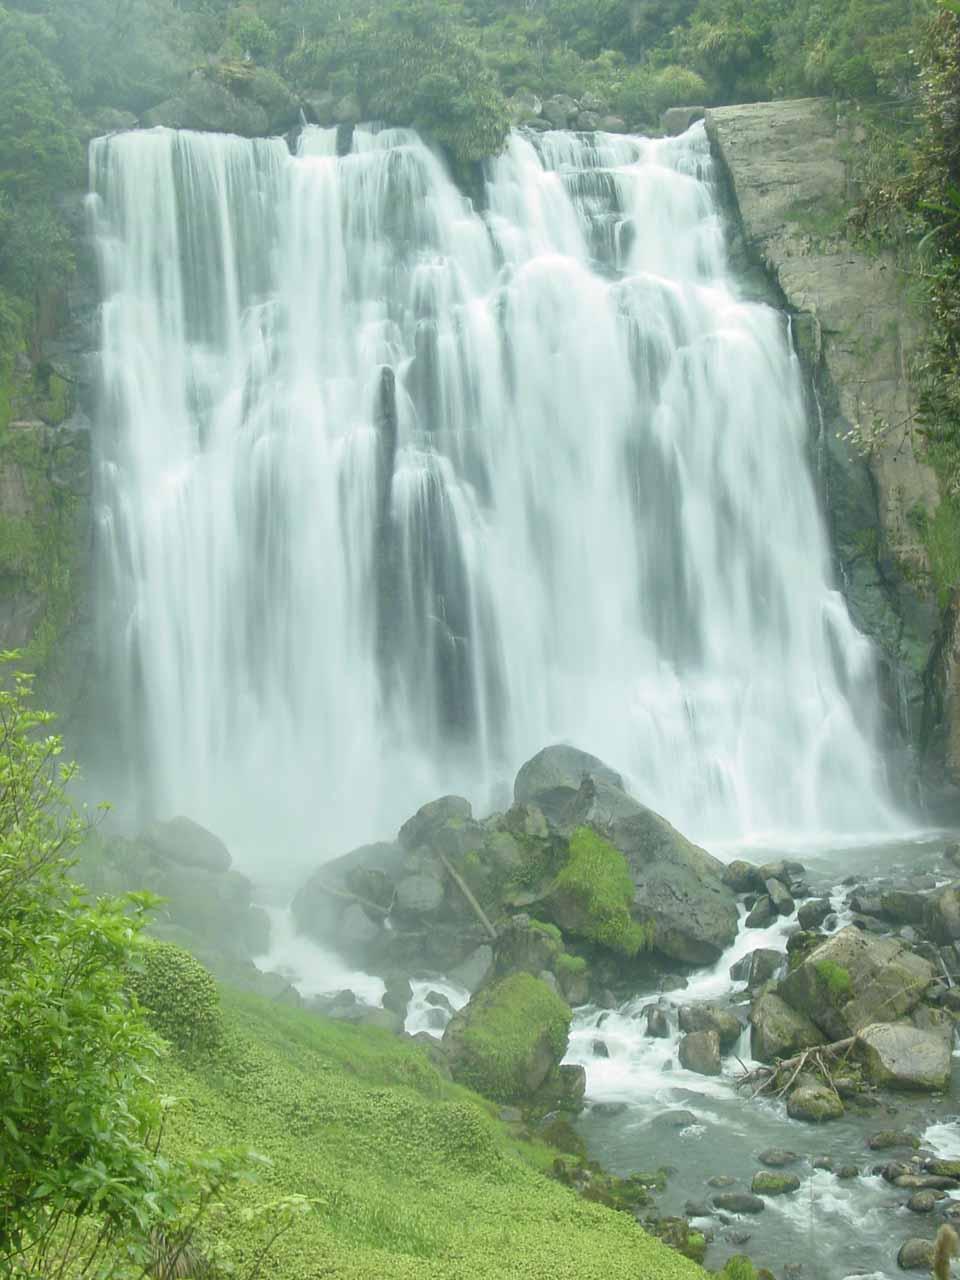 A closer examination of Marokopa Falls in long exposure seen in November 2004